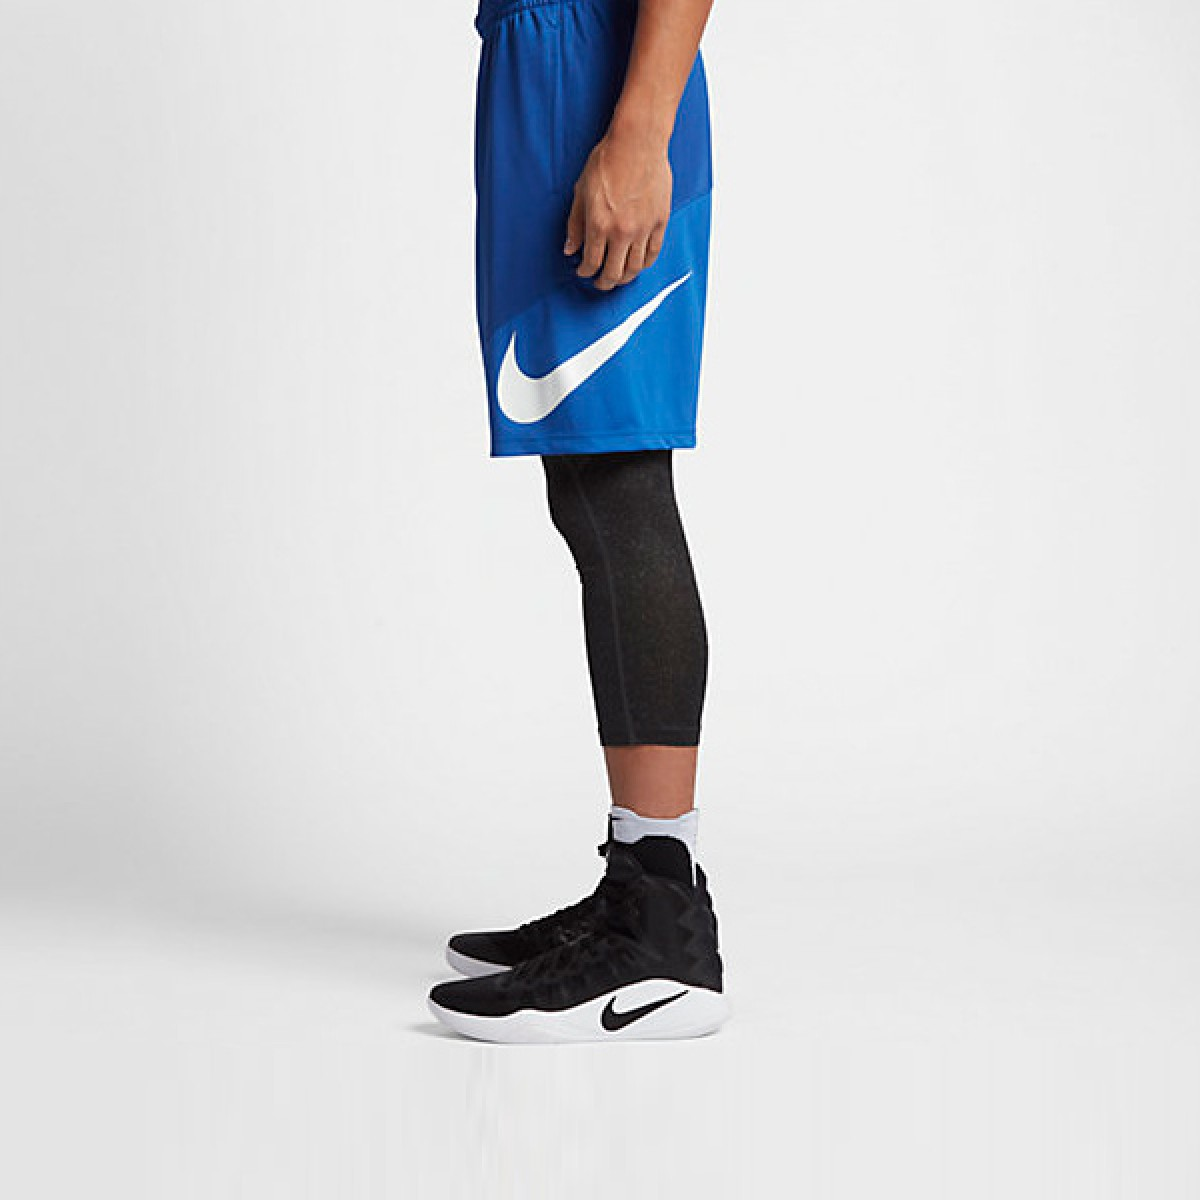 Nike Basketball Short 'Blue Royal' 718830-480